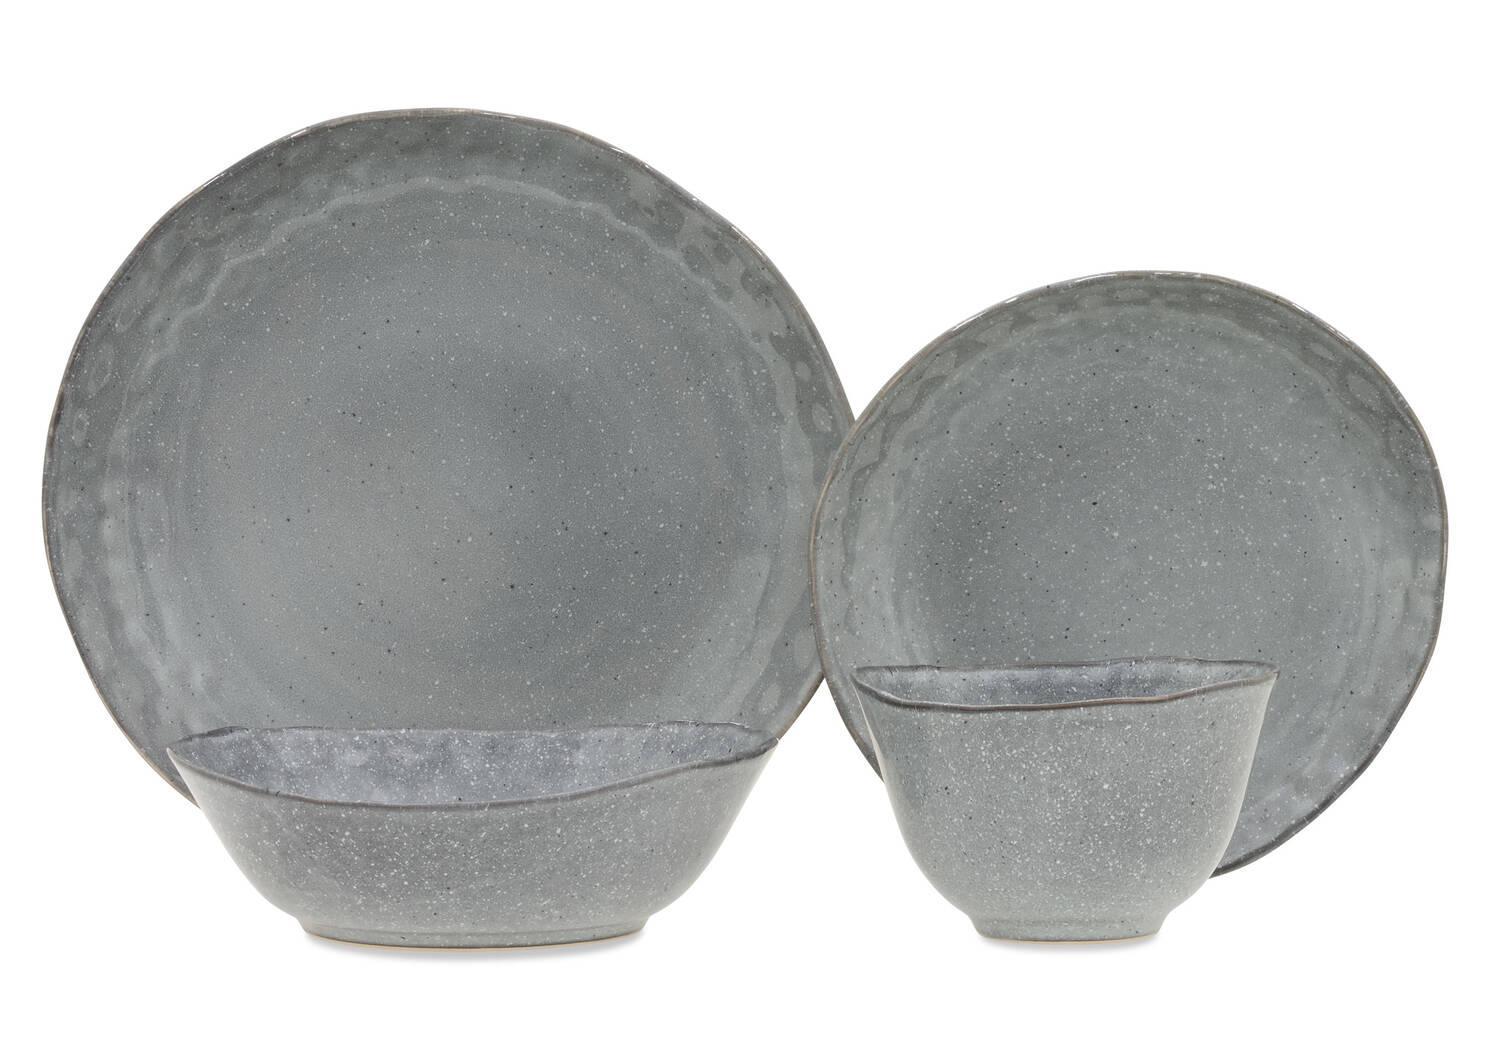 Serv vaisselle glacis Crofton 16p gris f